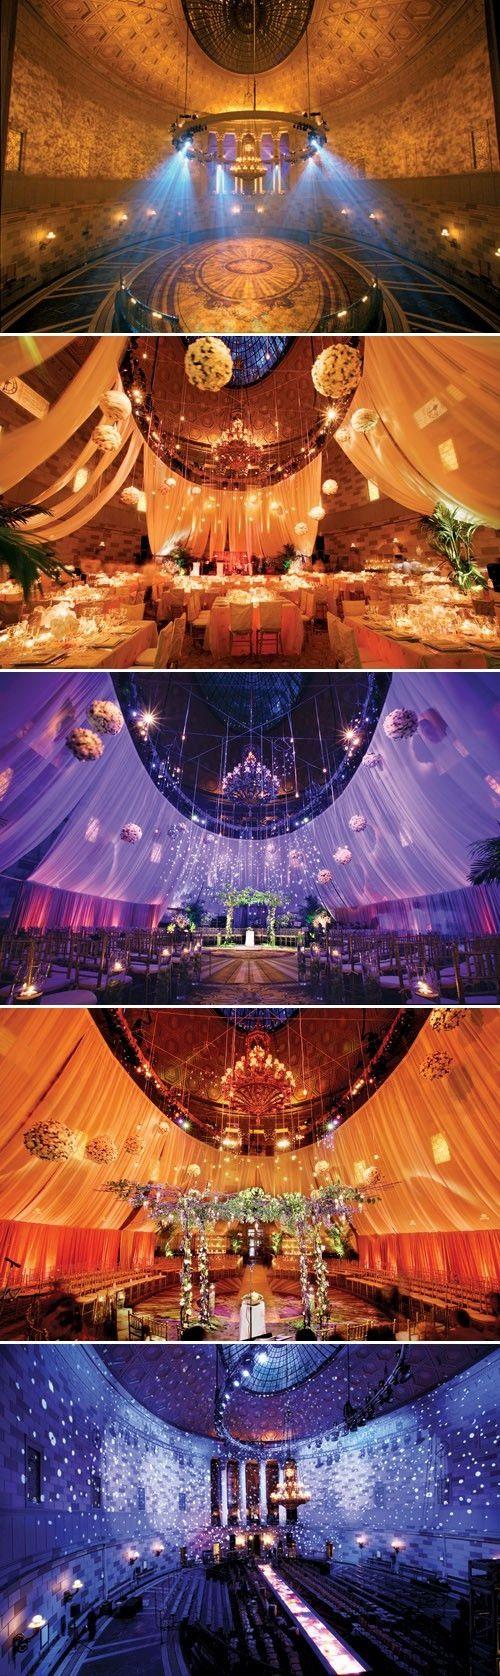 Eastern tiles and stunning lighting